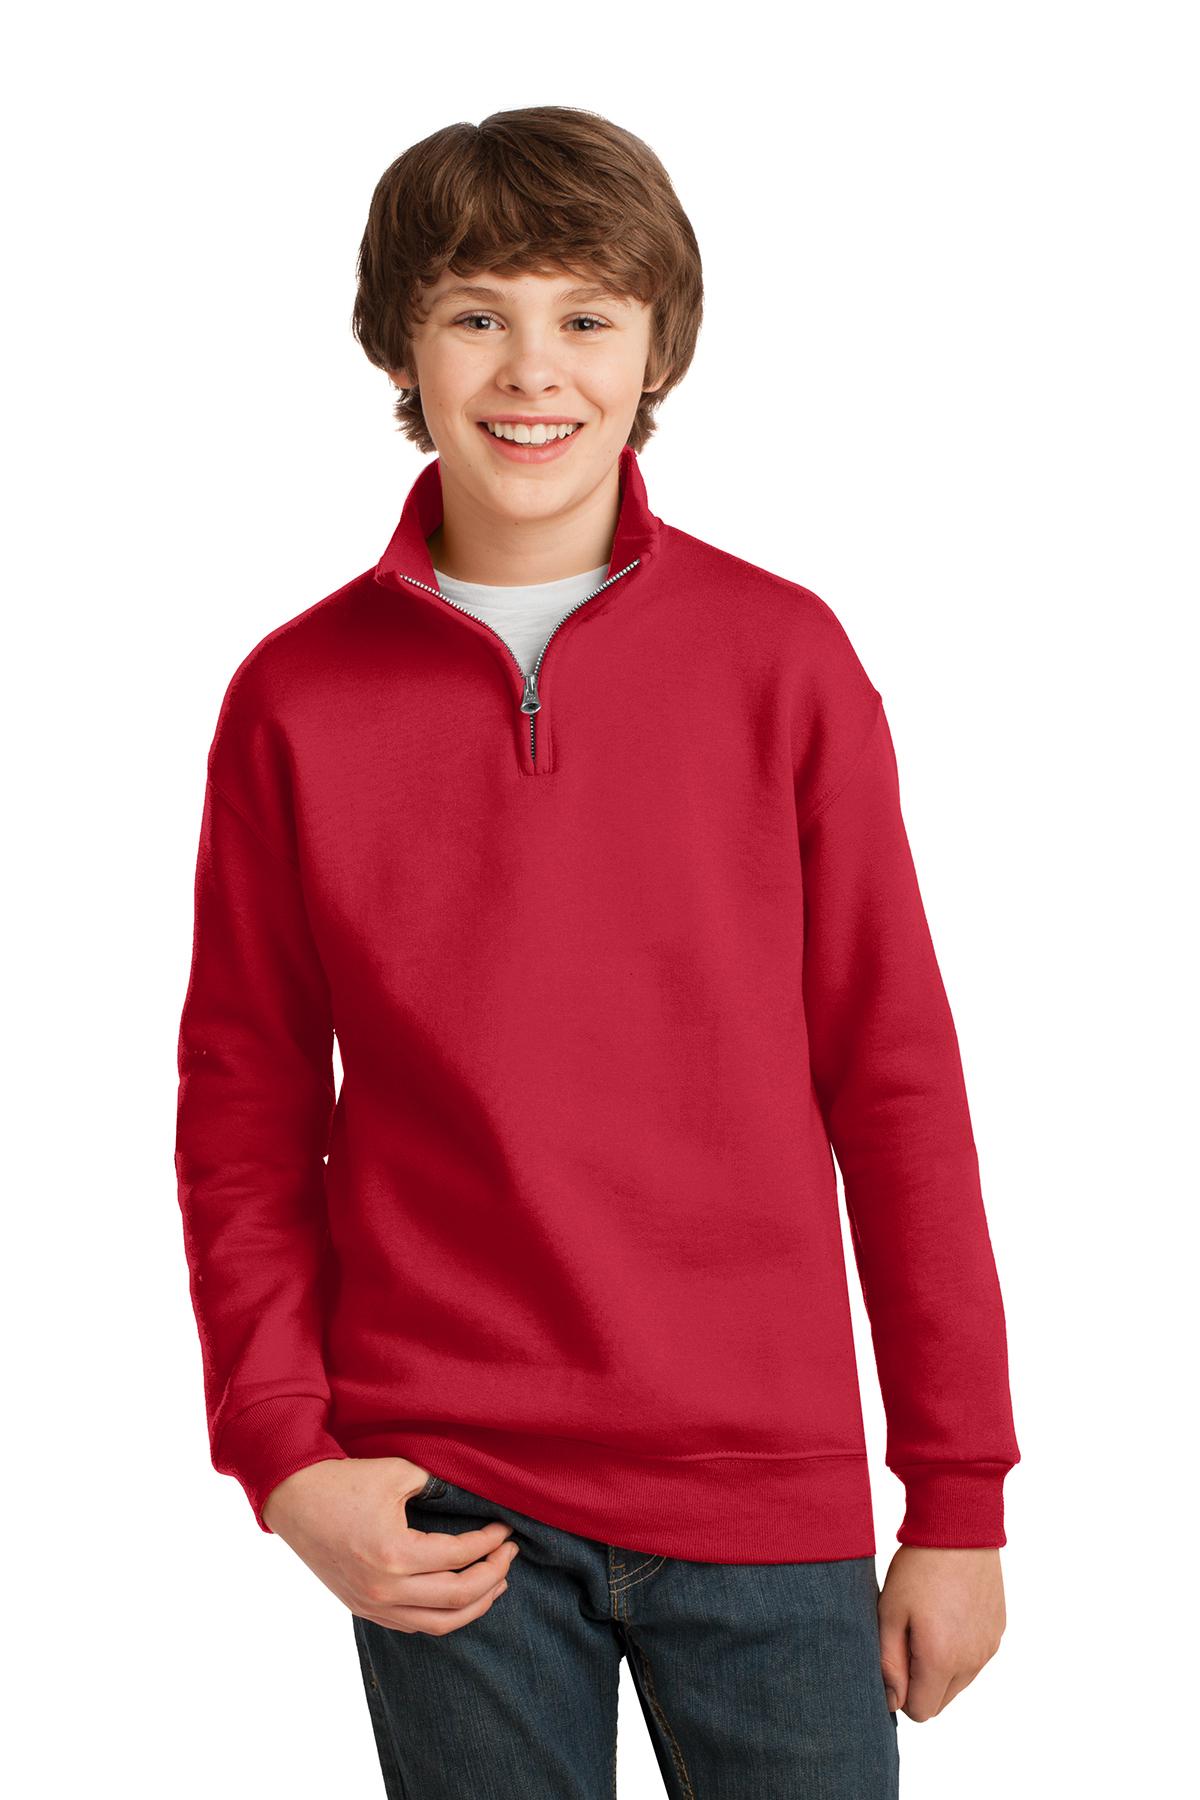 NuBlend Quarter-Zip Cadet Collar Sweatshirt 995Y S-XL Jerzees Youth 8 oz